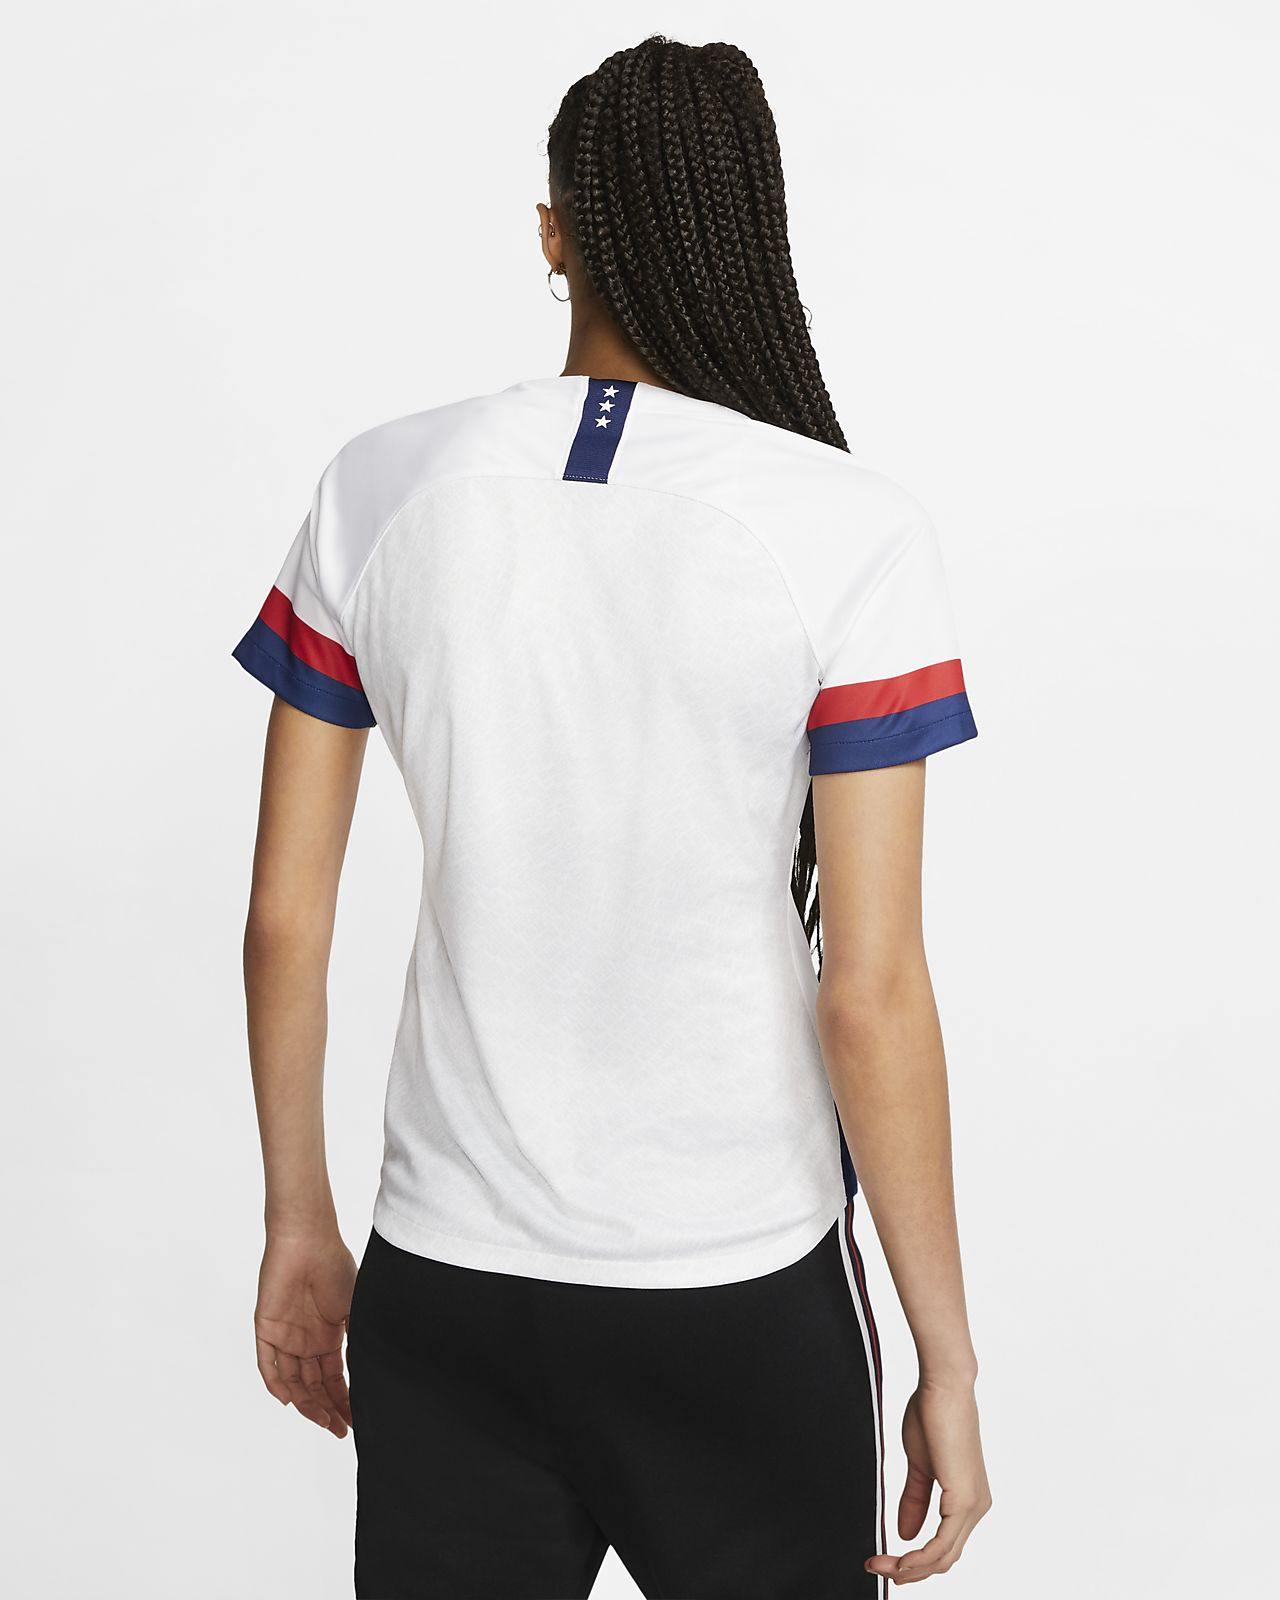 317184b4b U.S. 2019 Stadium Home Women s Soccer Jersey. Nike.com